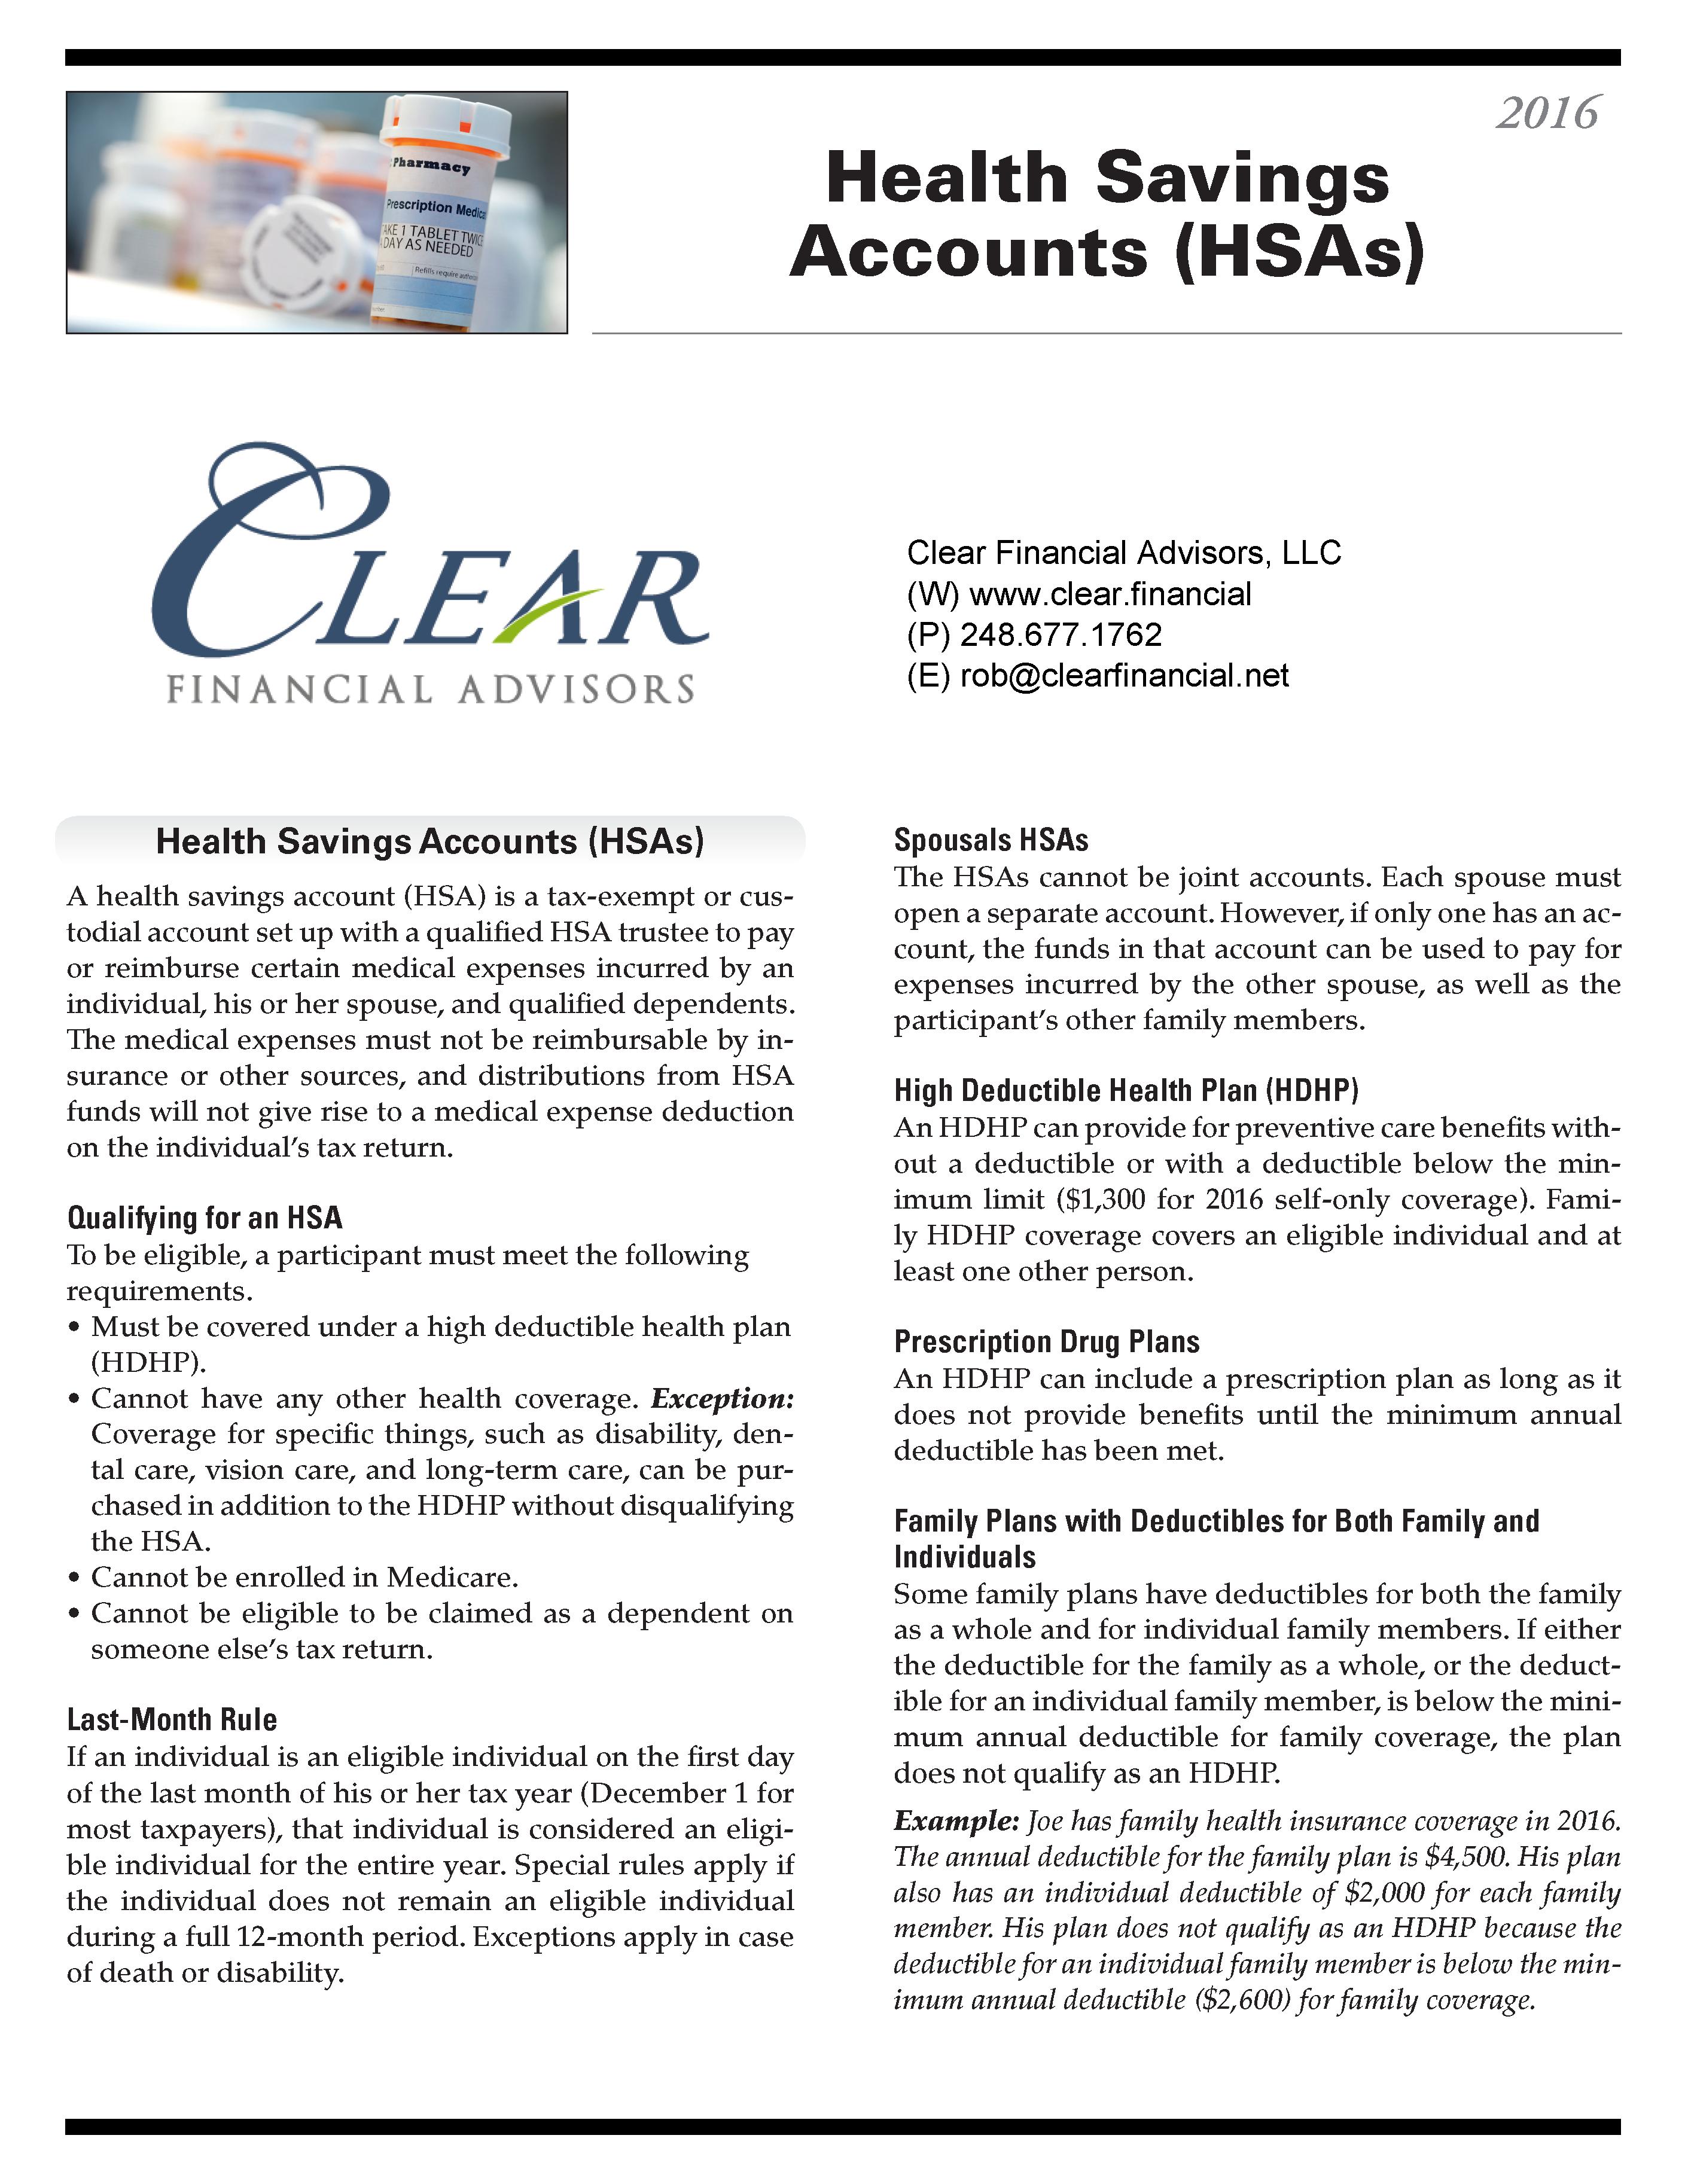 Health_Savings_Accounts_HSAs_2016_Page_1